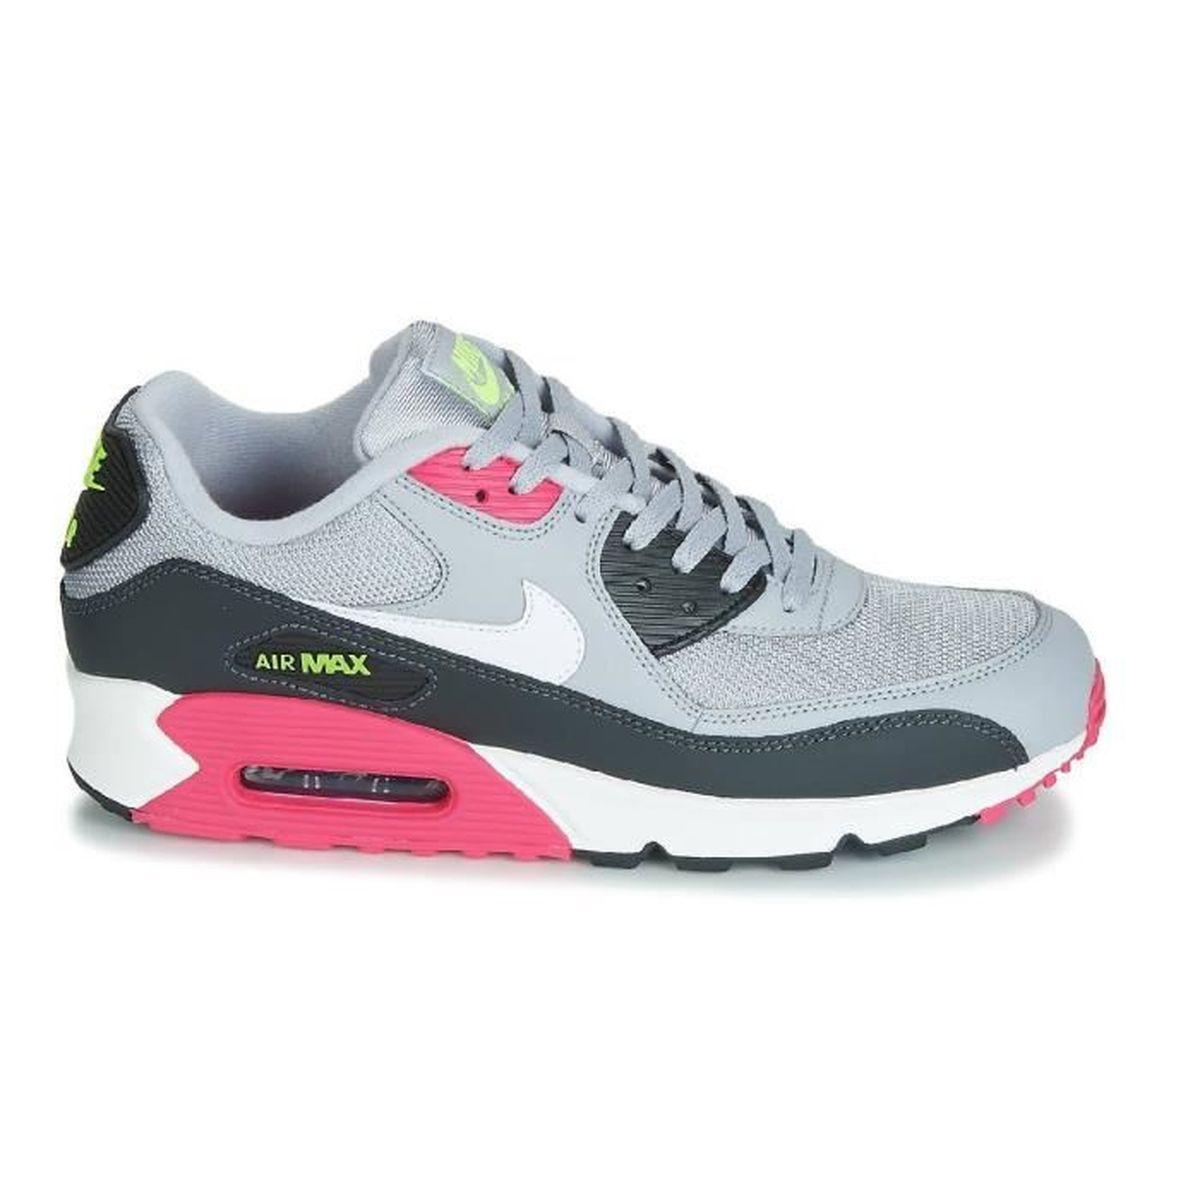 Nike 90 Achat Vente pas cher